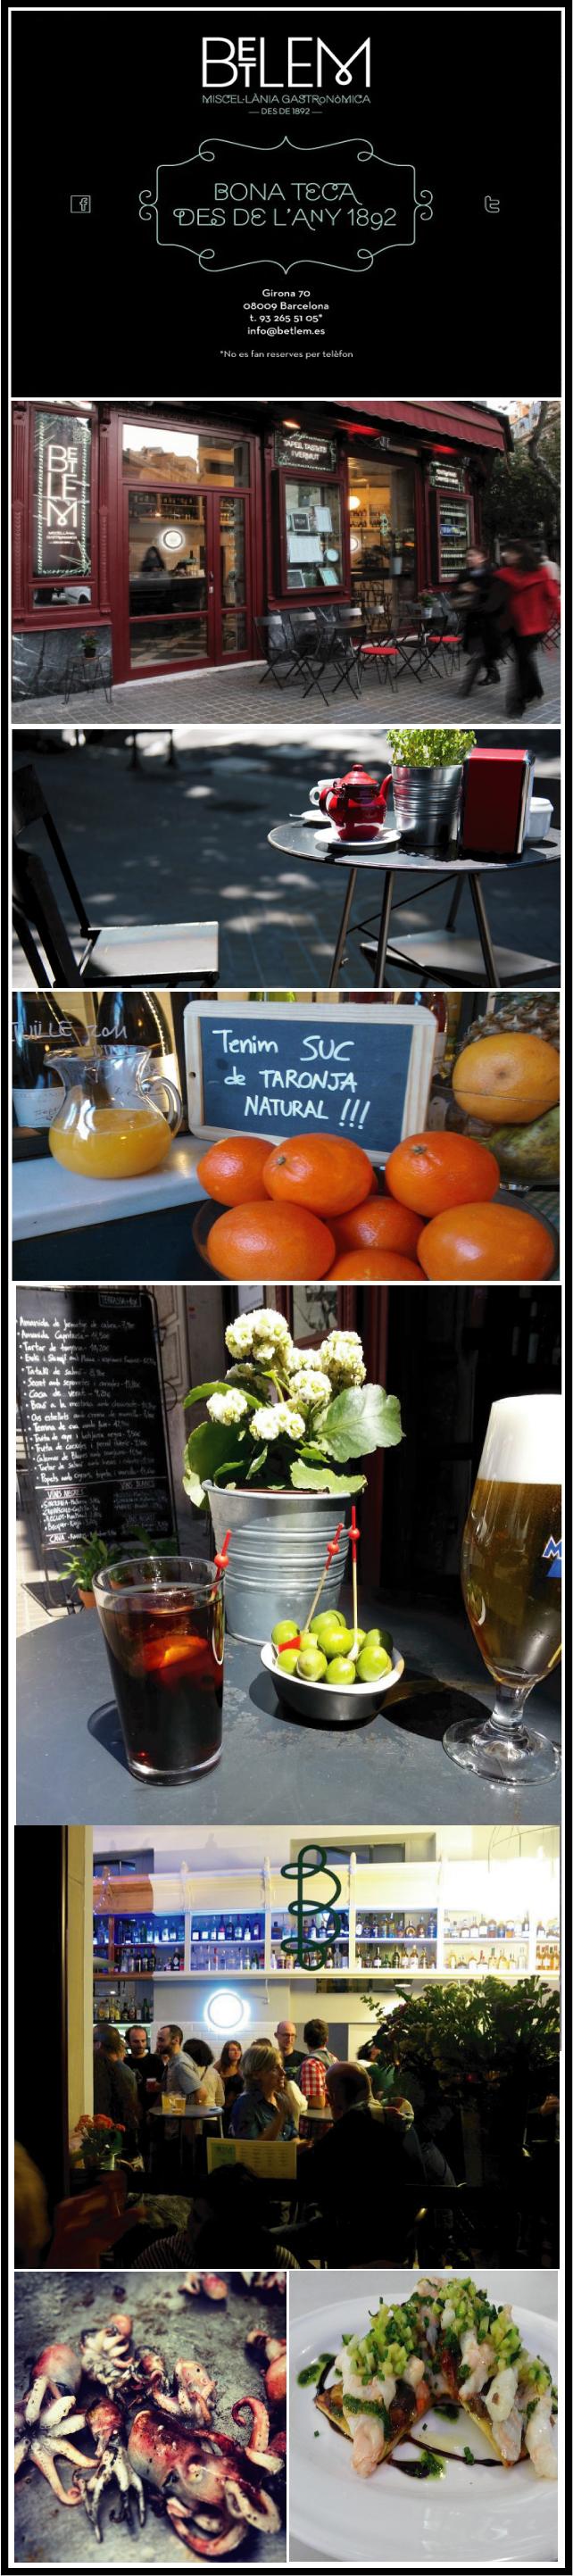 Betlem.bar a tapas gastronomiques barcelone chiara stella home